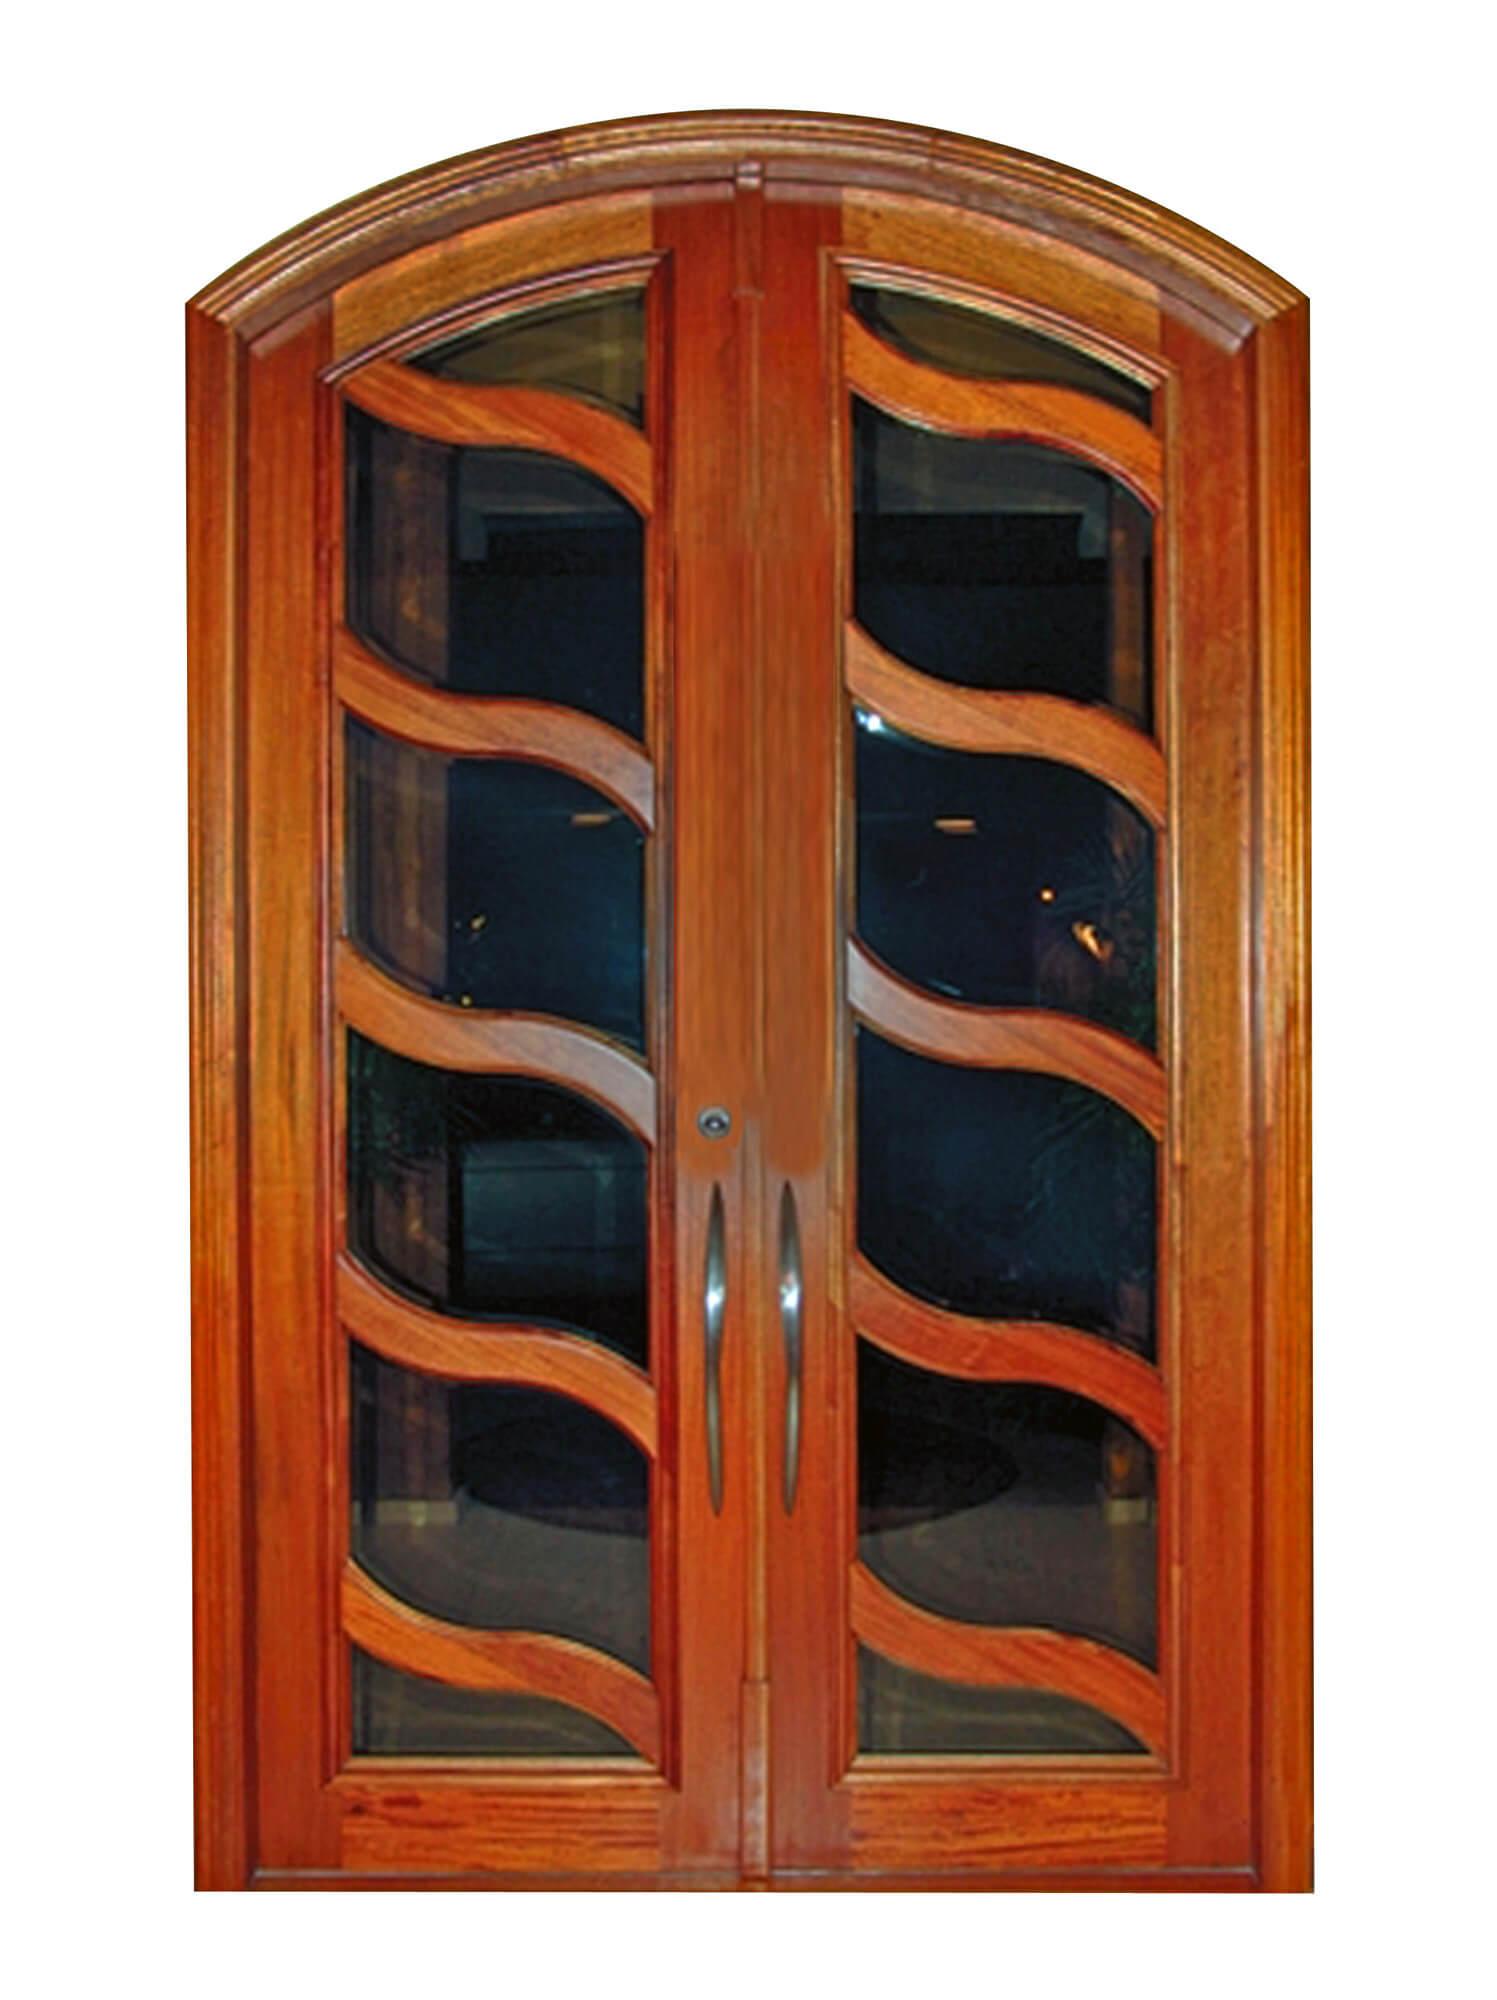 Trinidad Mahogany Doors Bellini Mastercraft